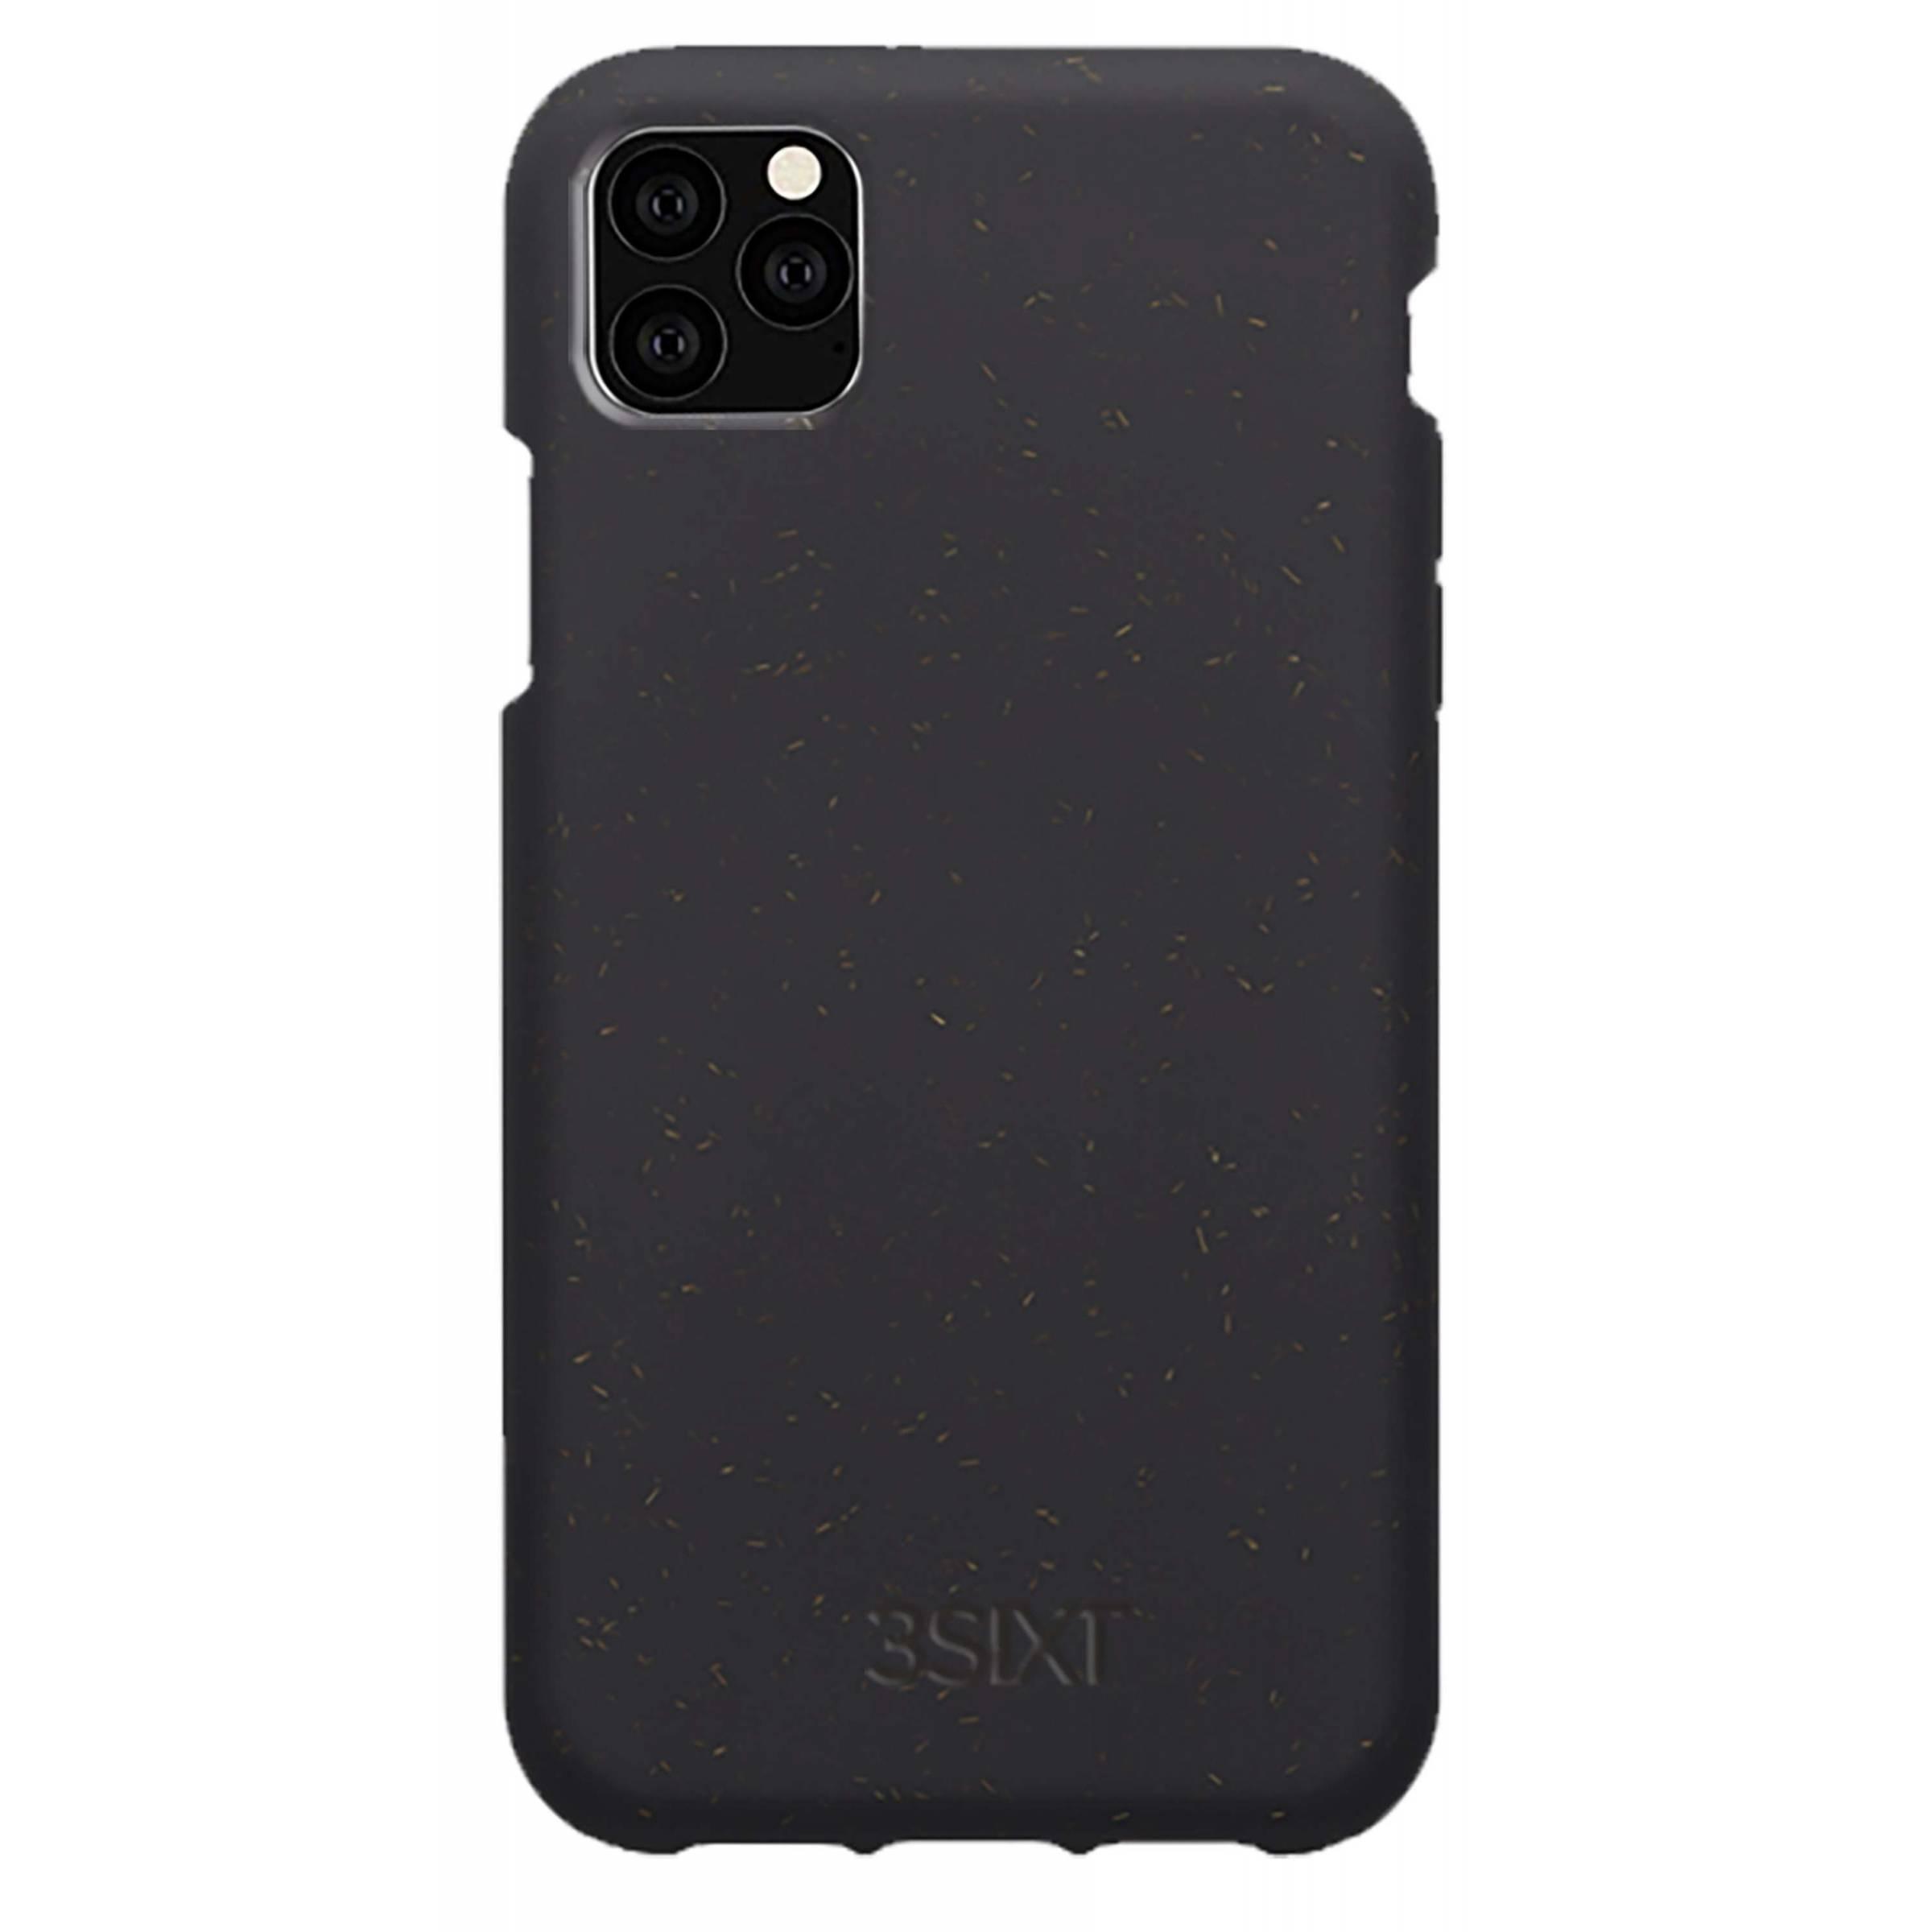 Bilde av 3sixt Iphone 11 Pro Max Biofleck Cover Af Bio-materiale